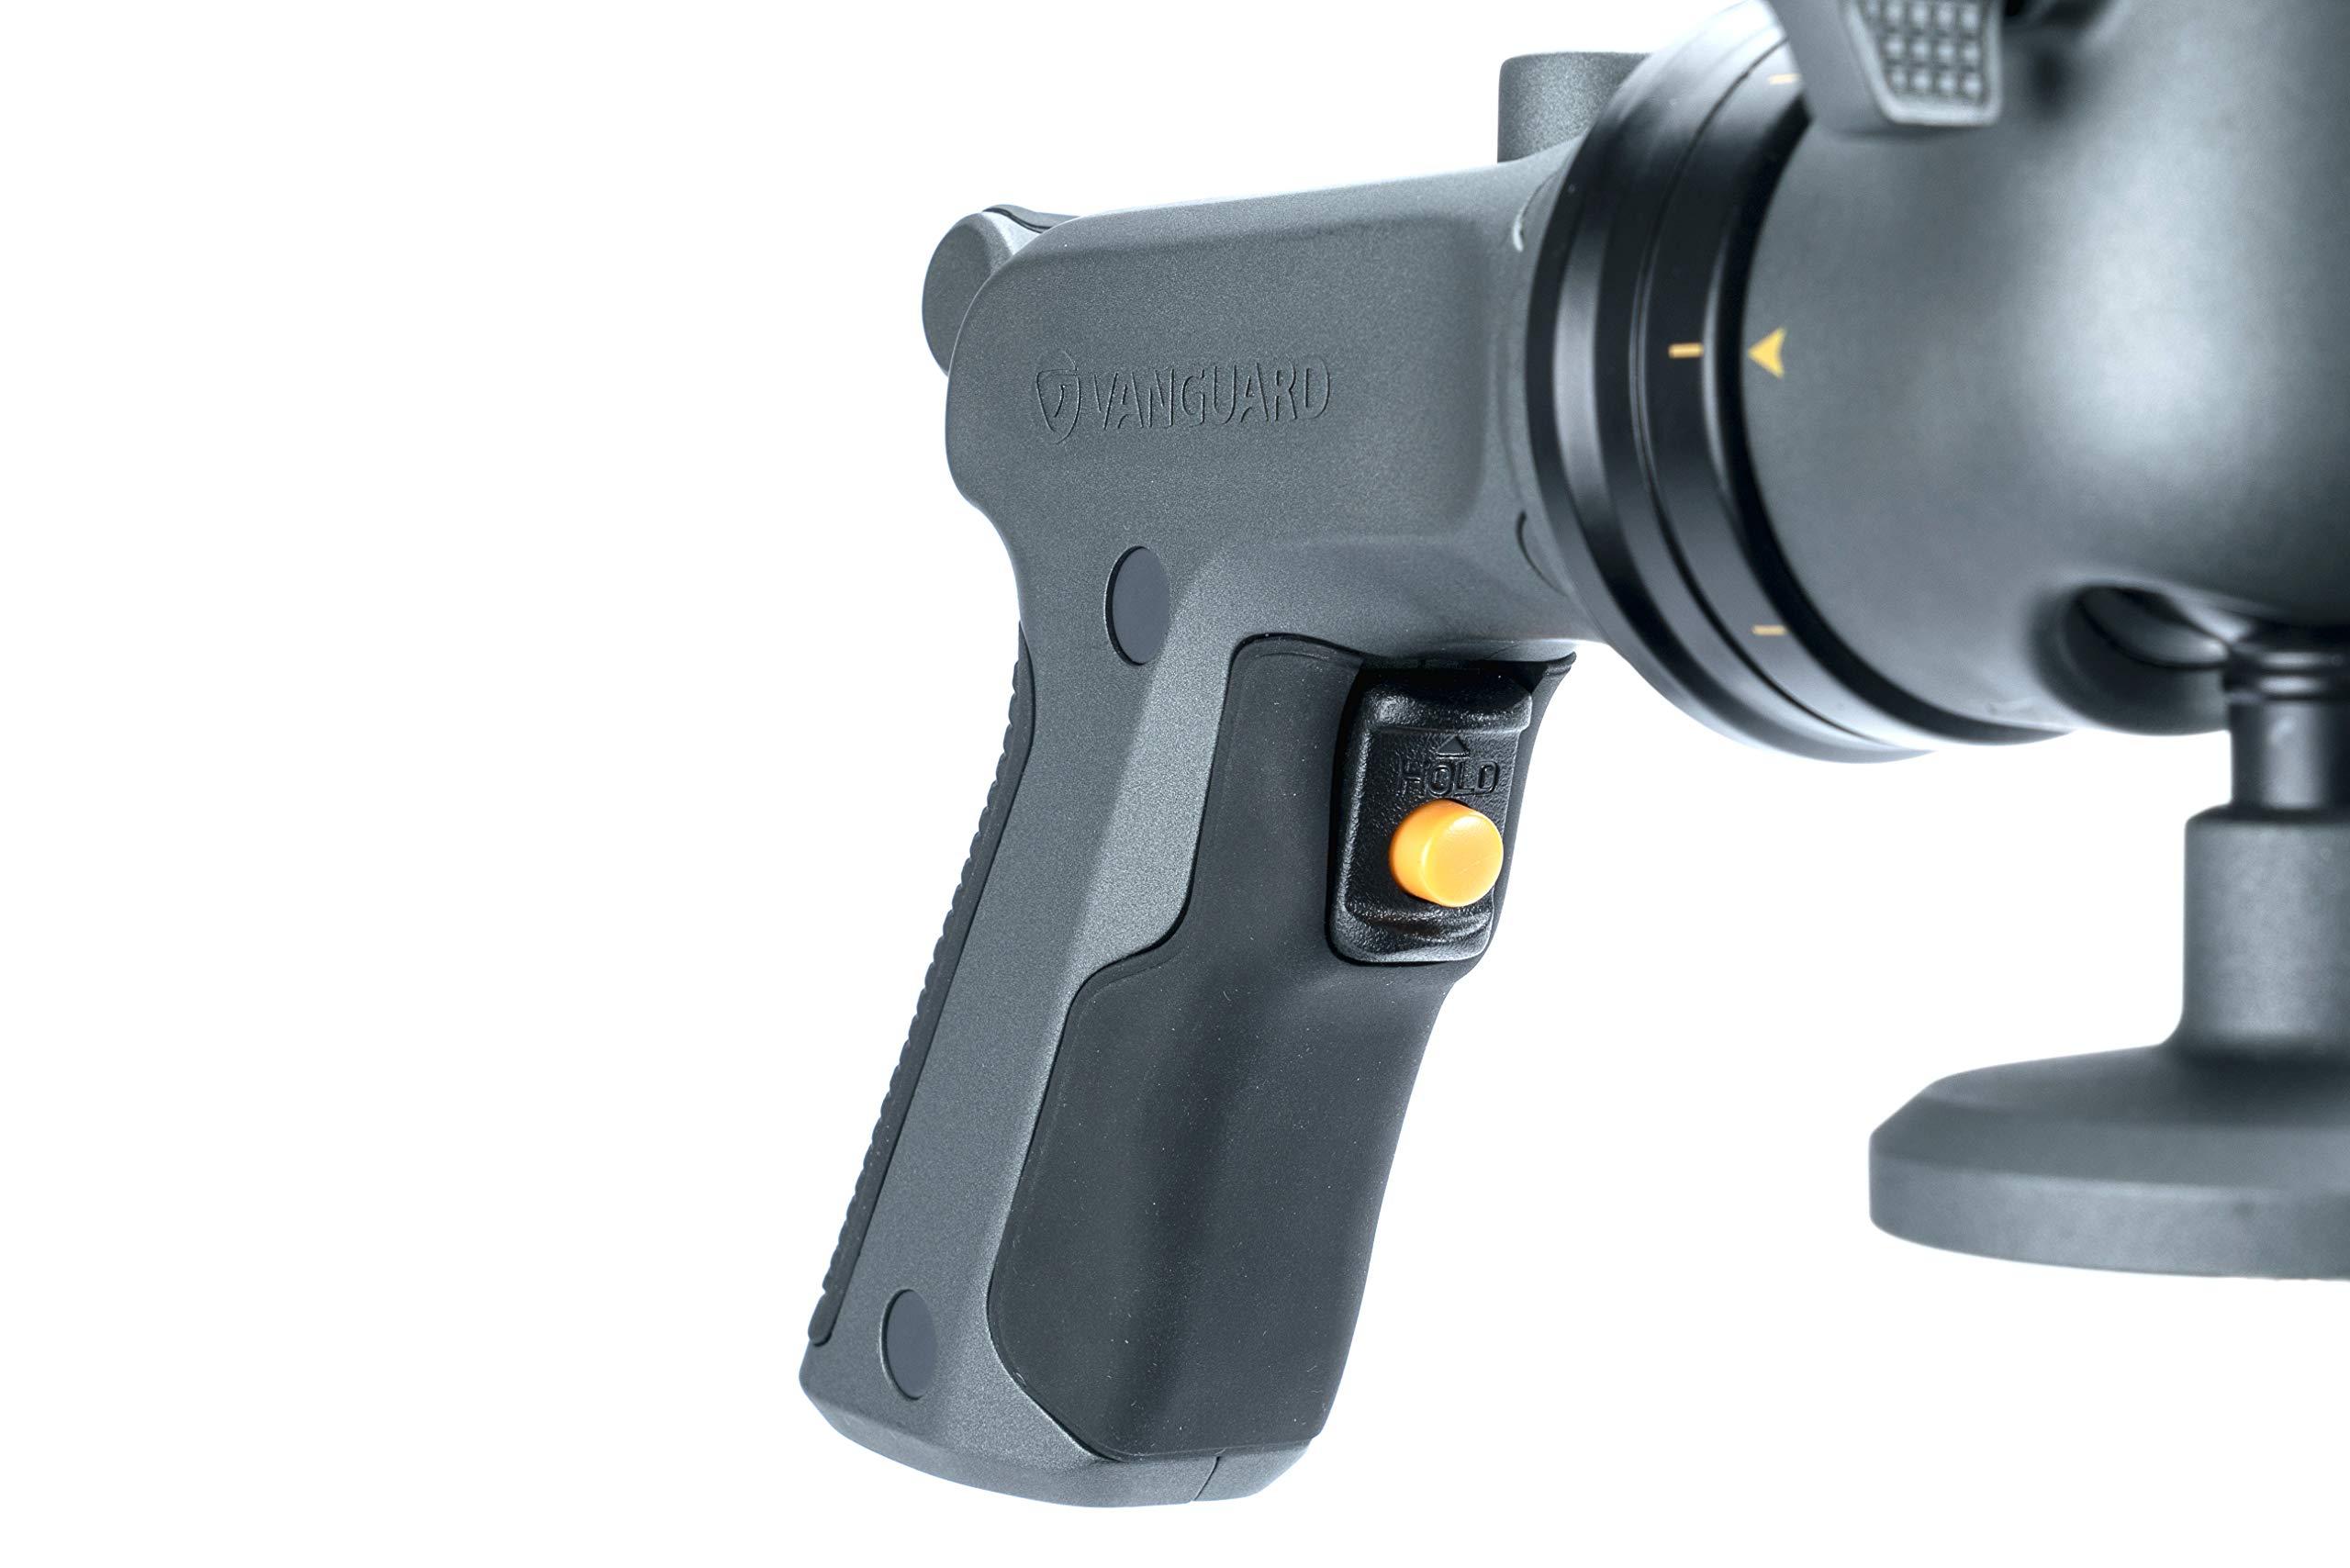 Vanguard ALTA Grip Tripod Head, Gray (ALTA GH-300T) by Vanguard (Image #6)